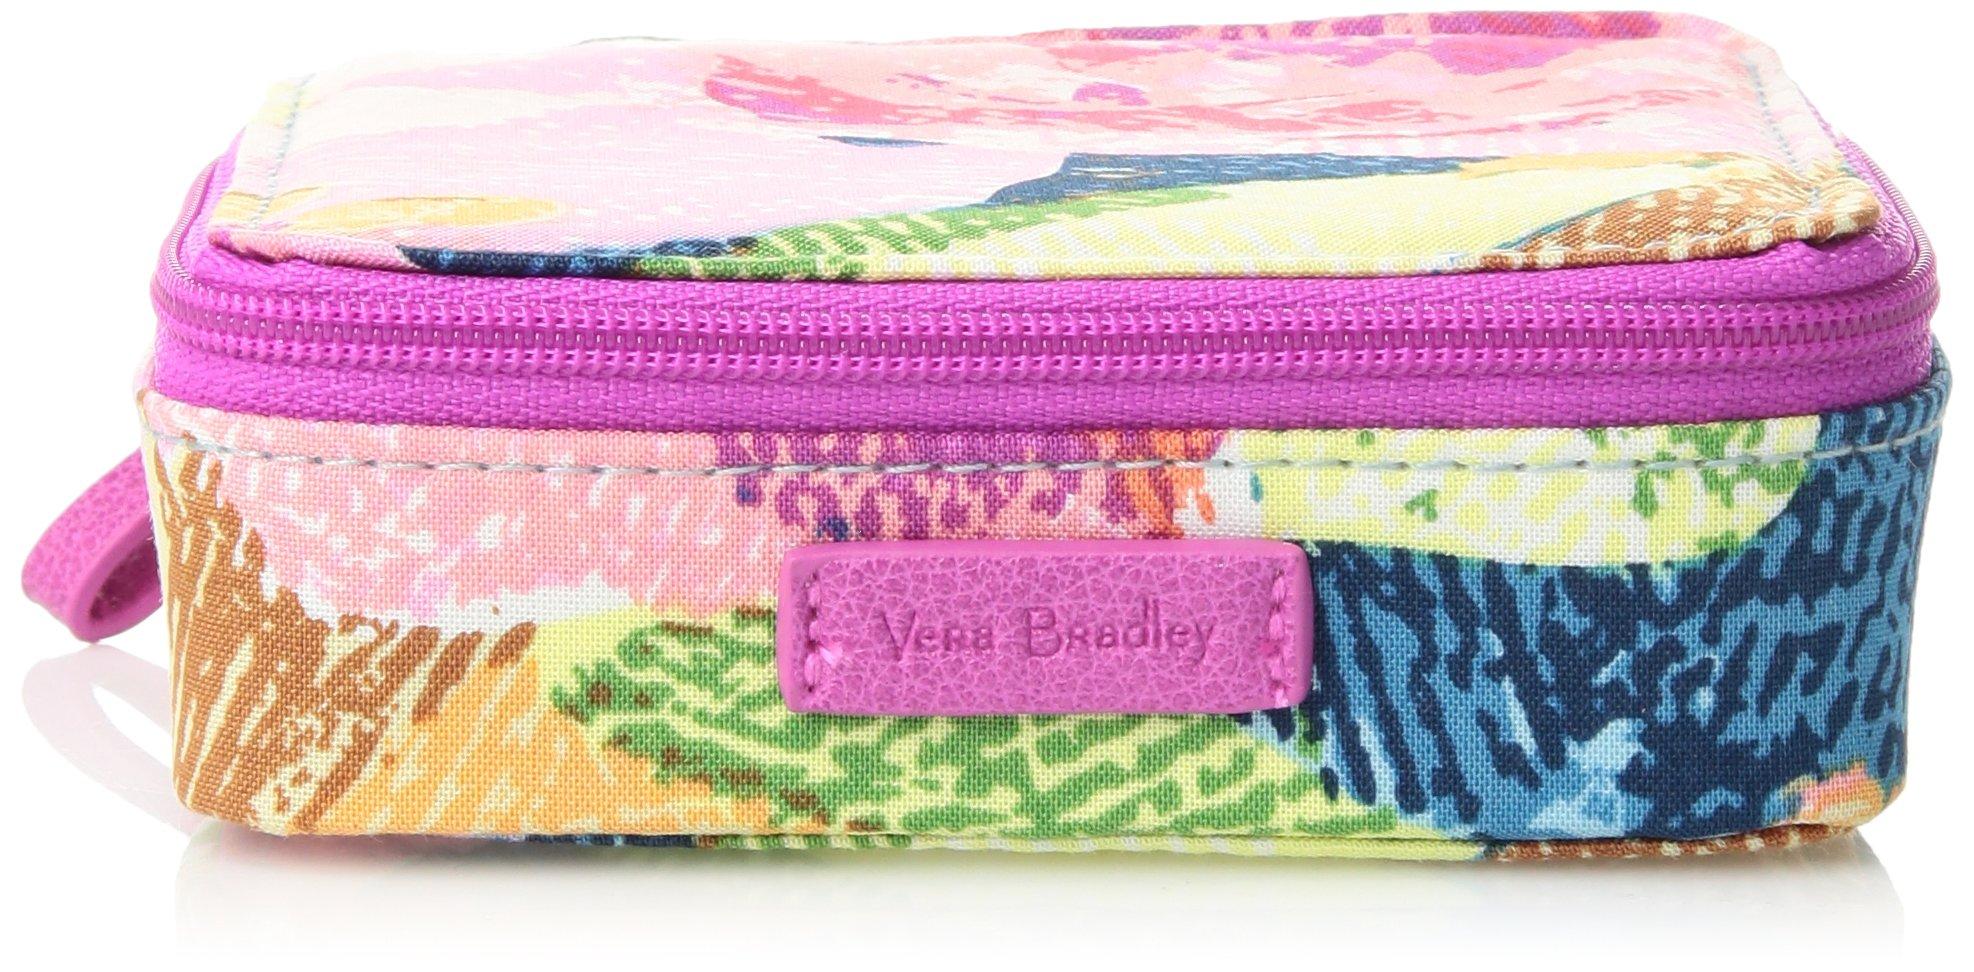 Vera Bradley Iconic Travel Pill Case, Signature Cotton, Superbloom